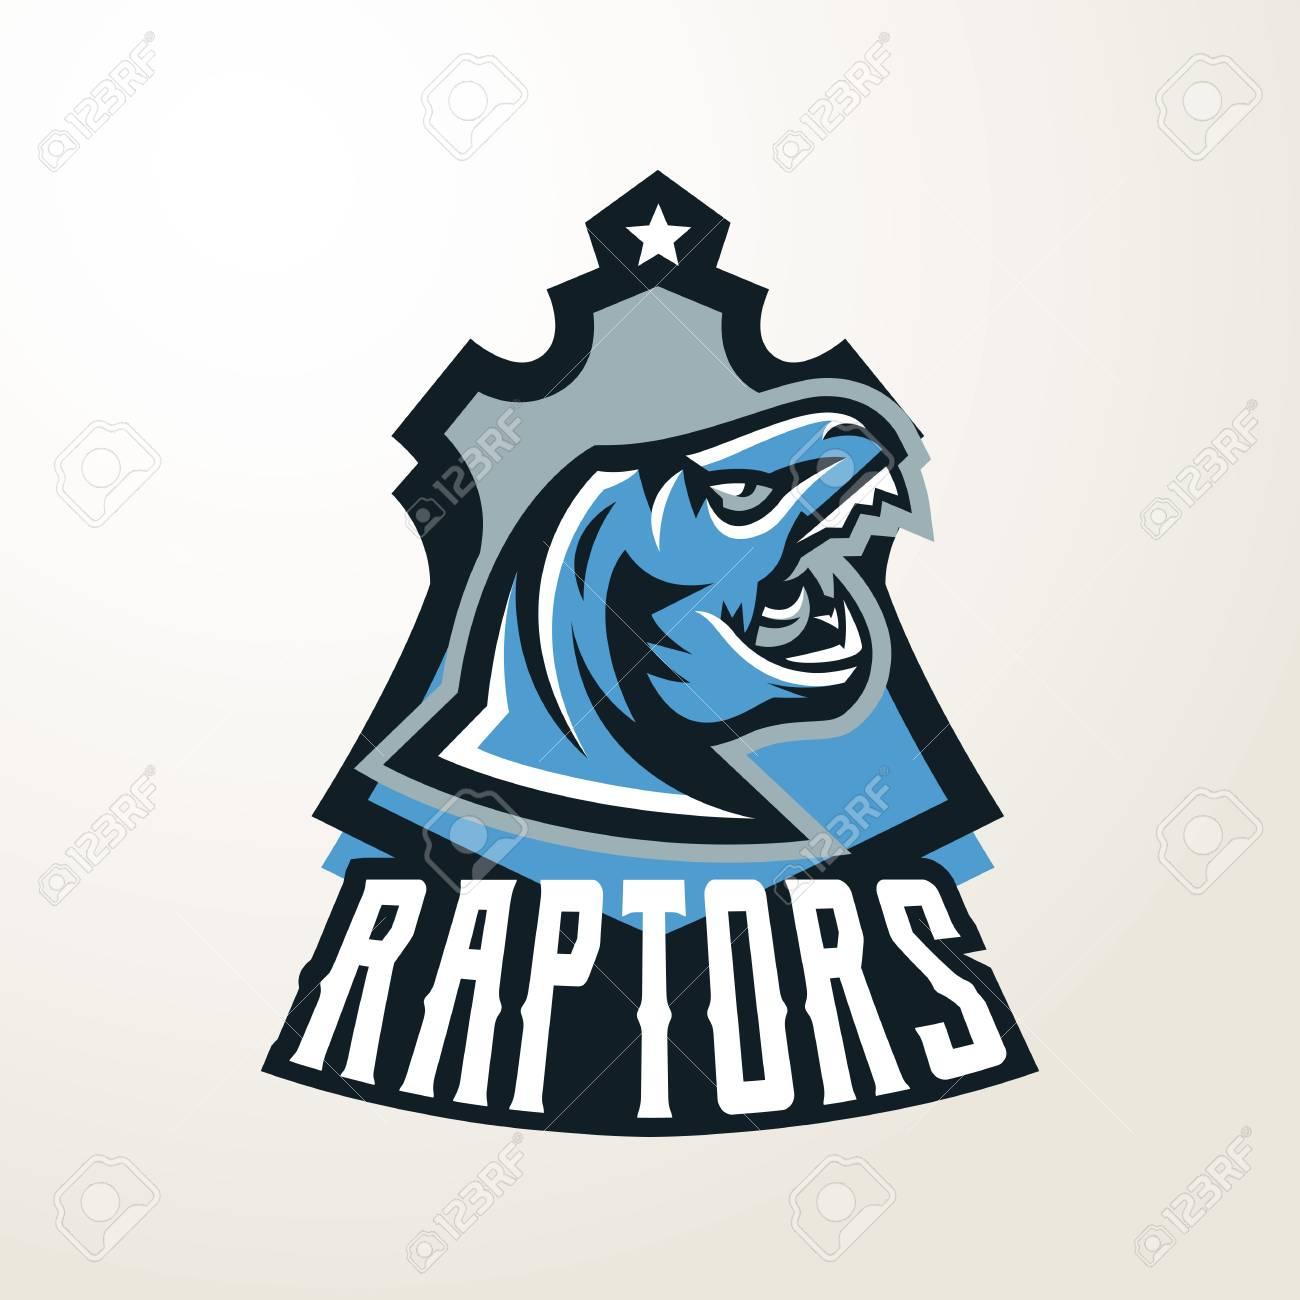 Emblem sticker badge dinosaur head logo predator jurassic a dangerous beast